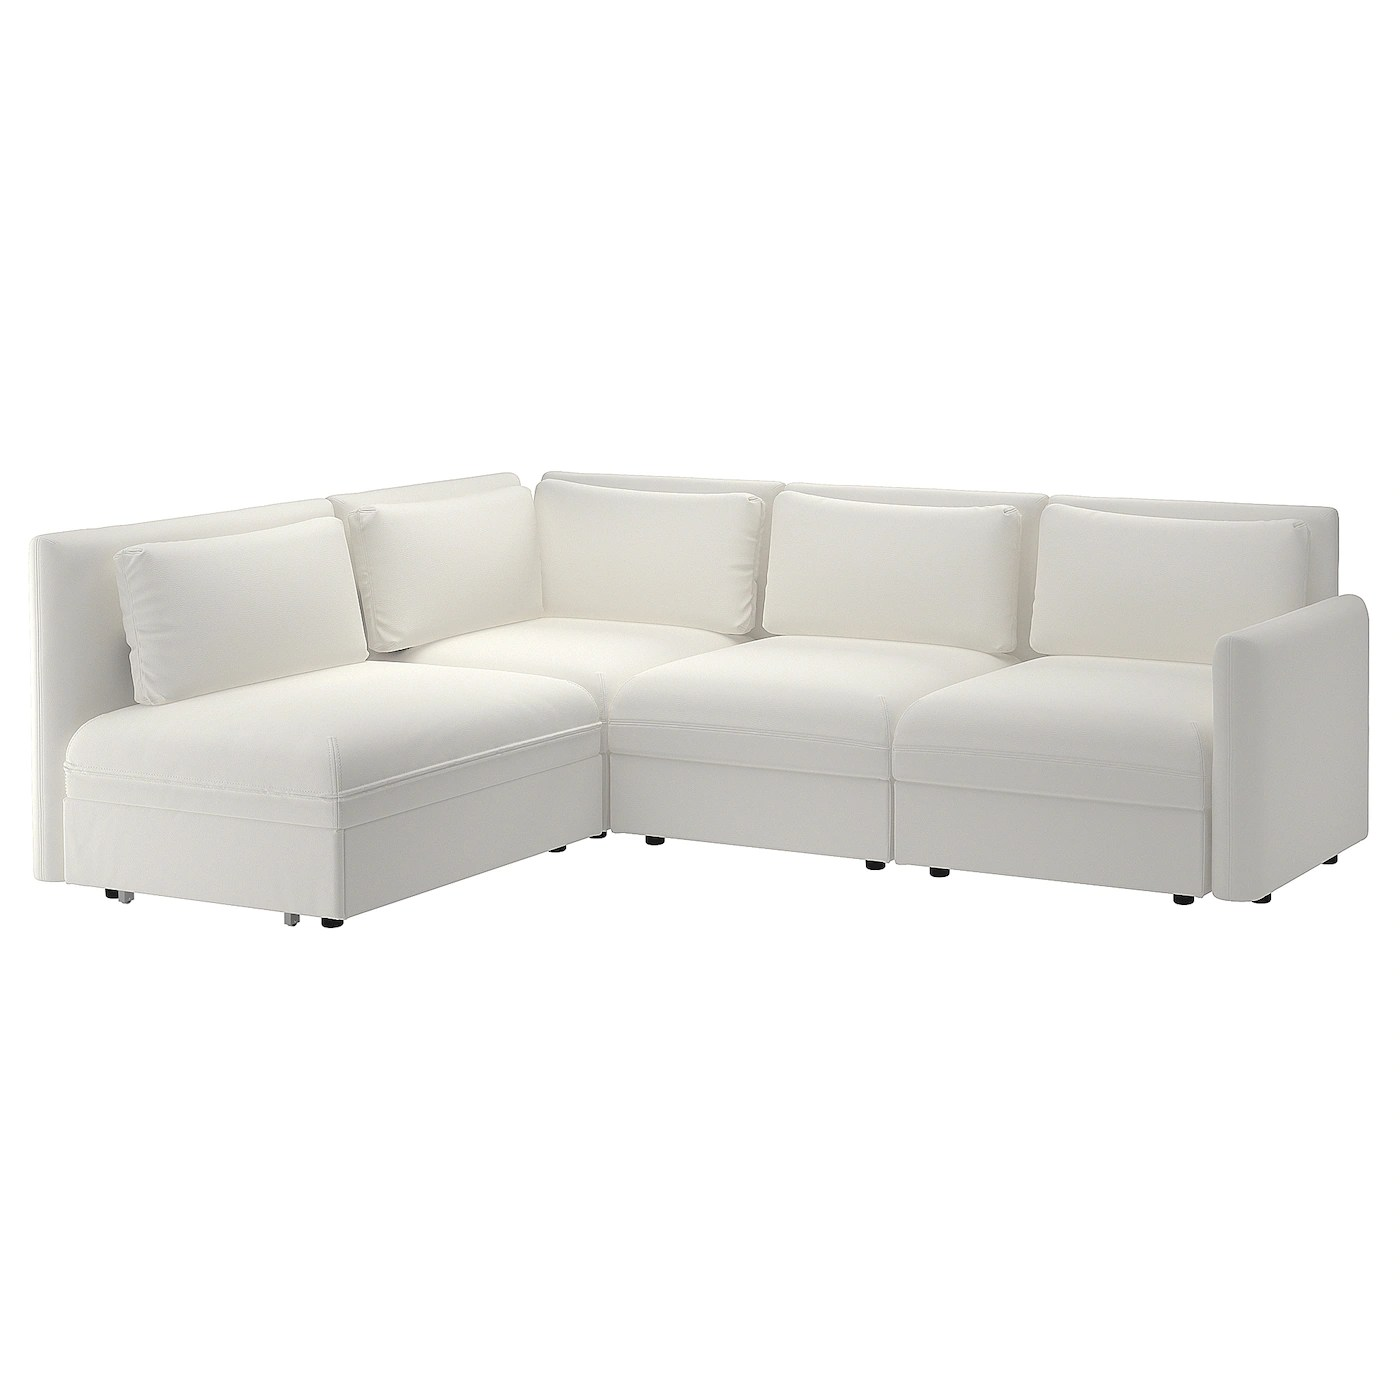 karlstad 3 seat sofa bed cover london leather company beds corner futons ikea vallentuna modular